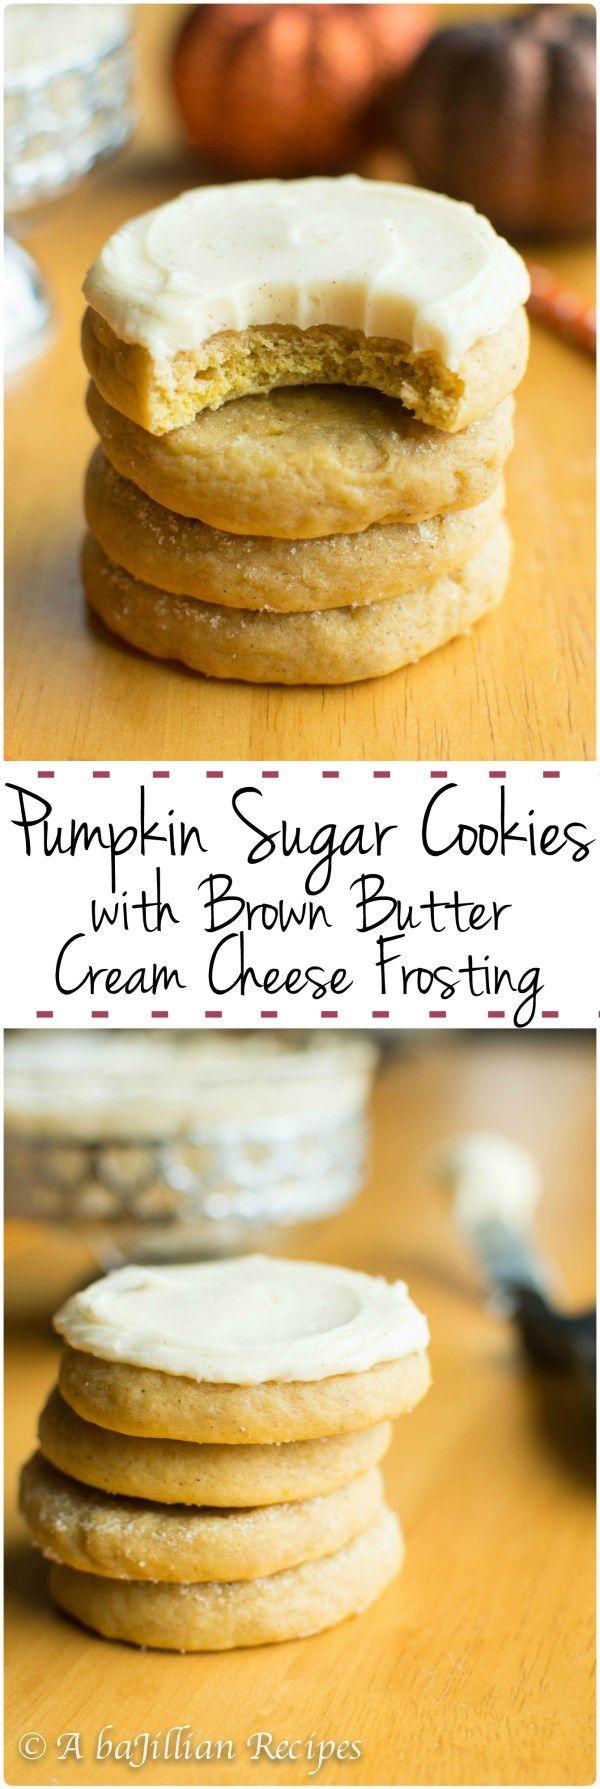 Pumpkin Sugar Cookies w/ Brown Butter Cream Cheese Frosting | A baJillian Recipes